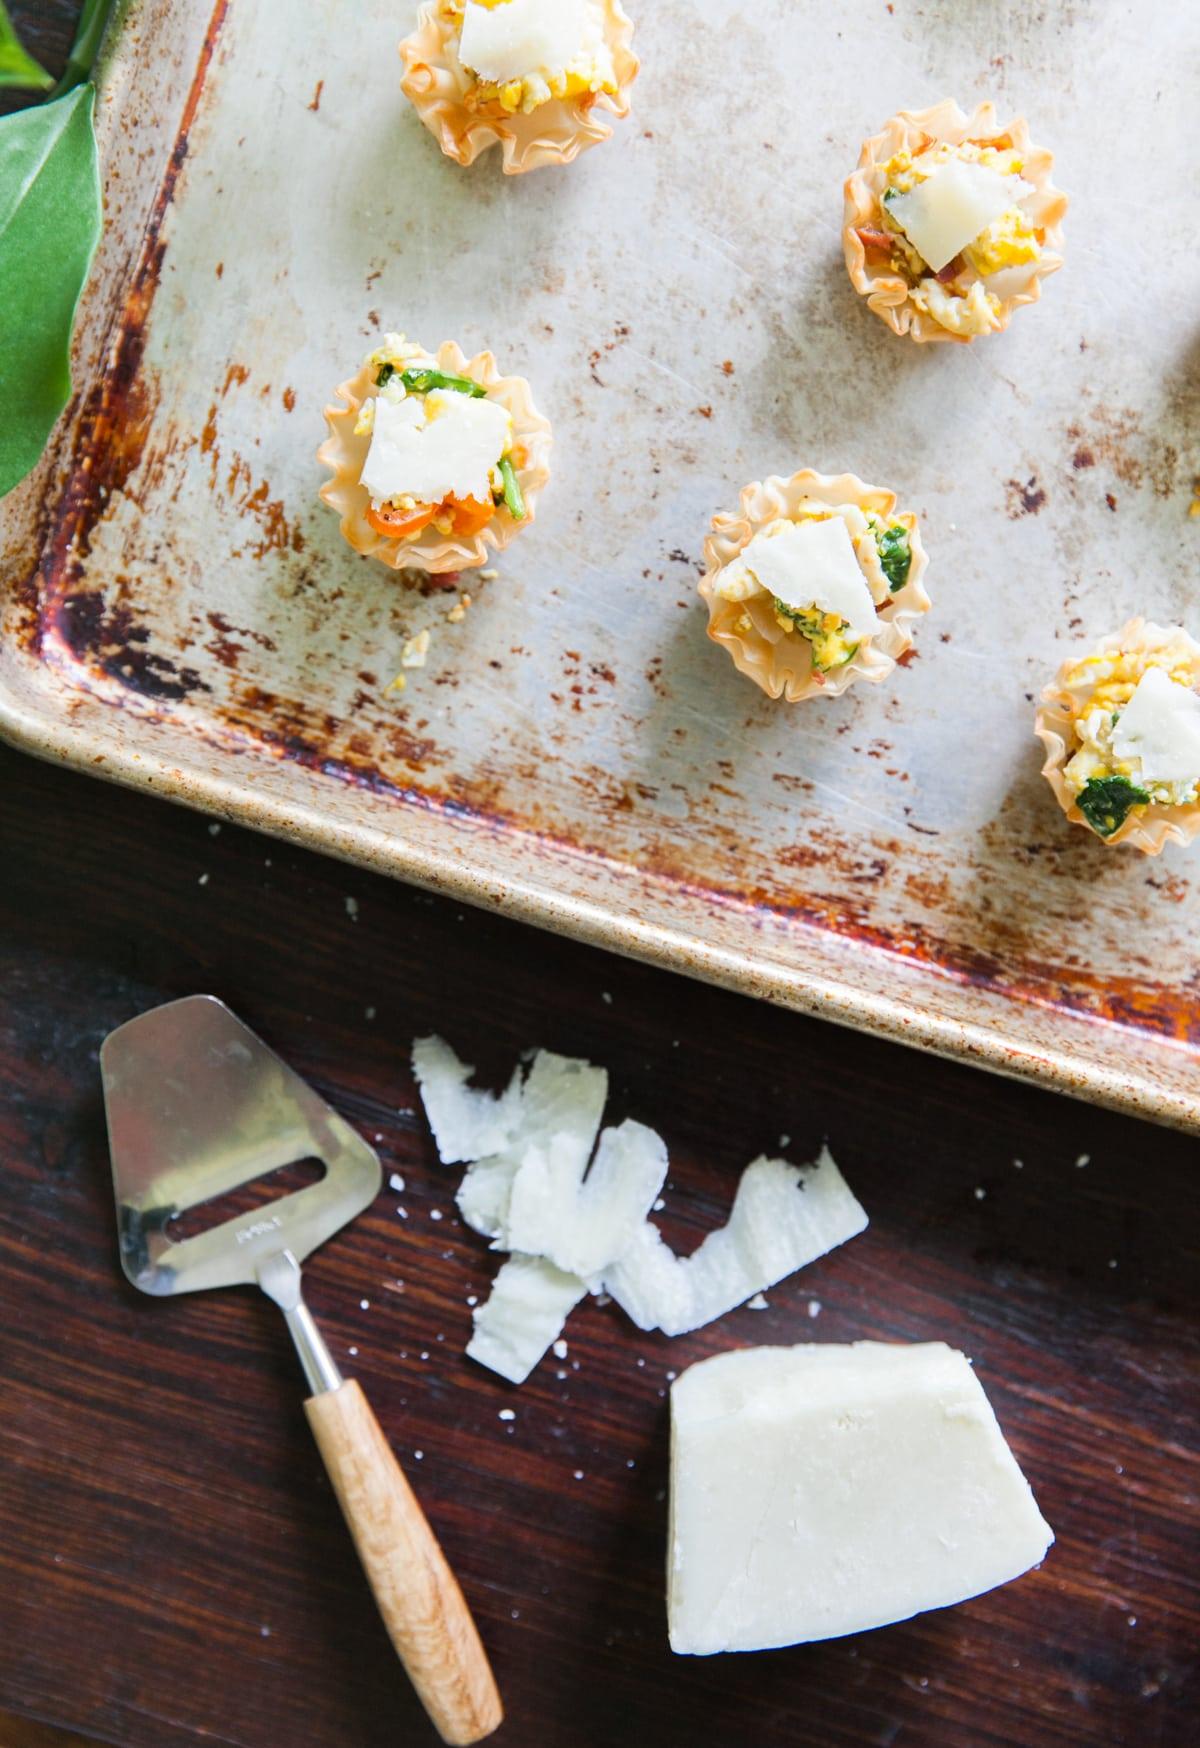 Brunch Time | Mini Frittatas with Tomato + Crispy Pancetta | Quick Brunch Recipes | Amuse Bouche Breakfast Foods | Jessica Brigham Magazine for Life